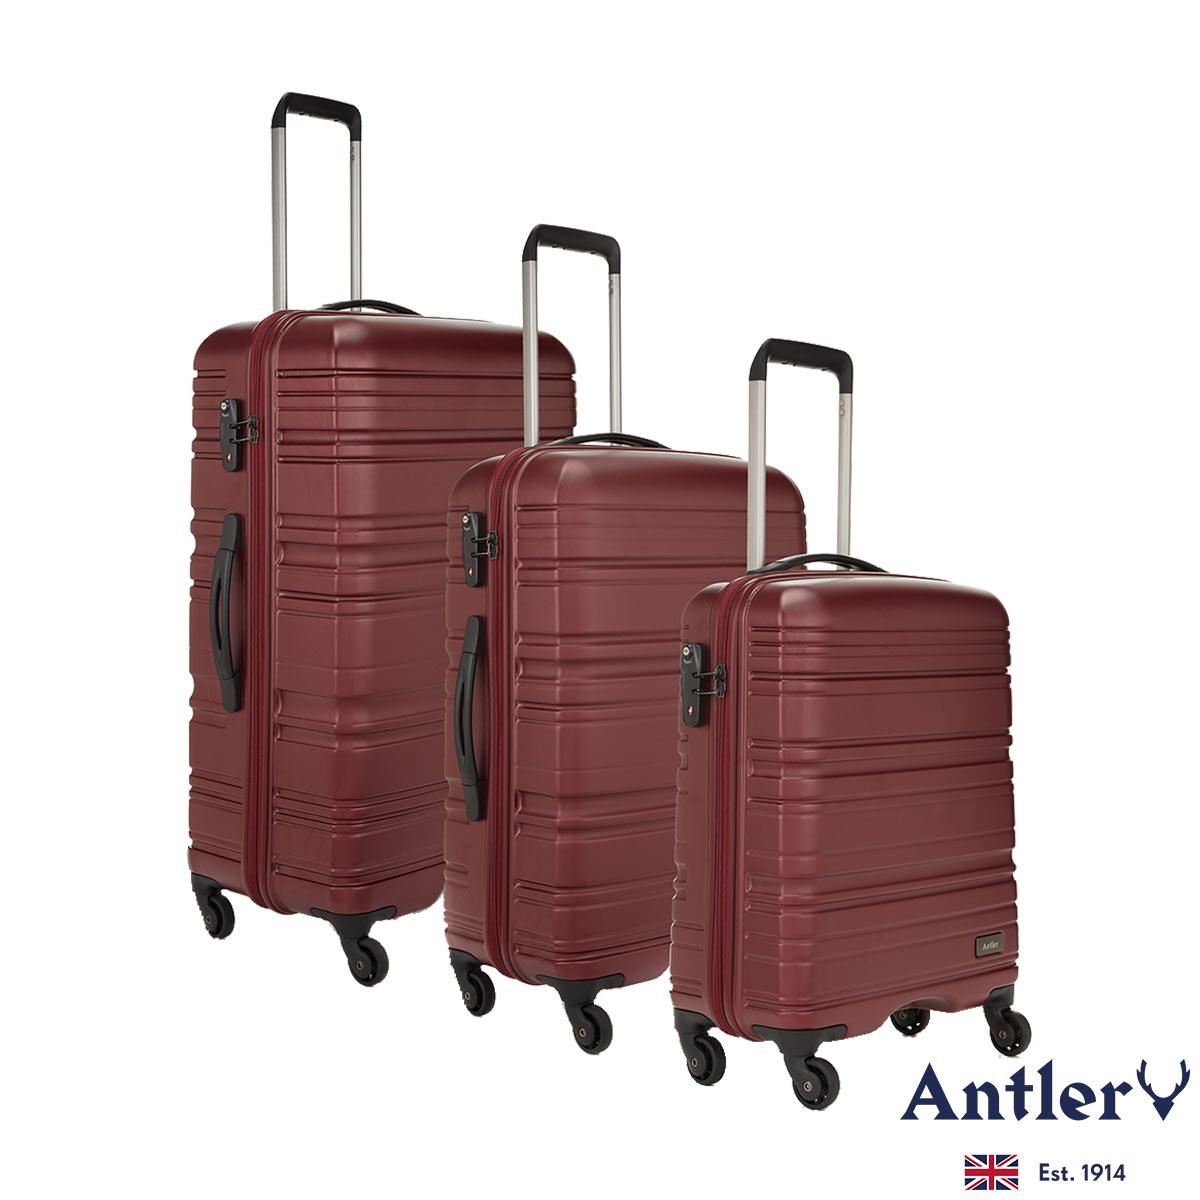 Antler 3 Piece Hard Suitcase Set - £104.99 @ Costco